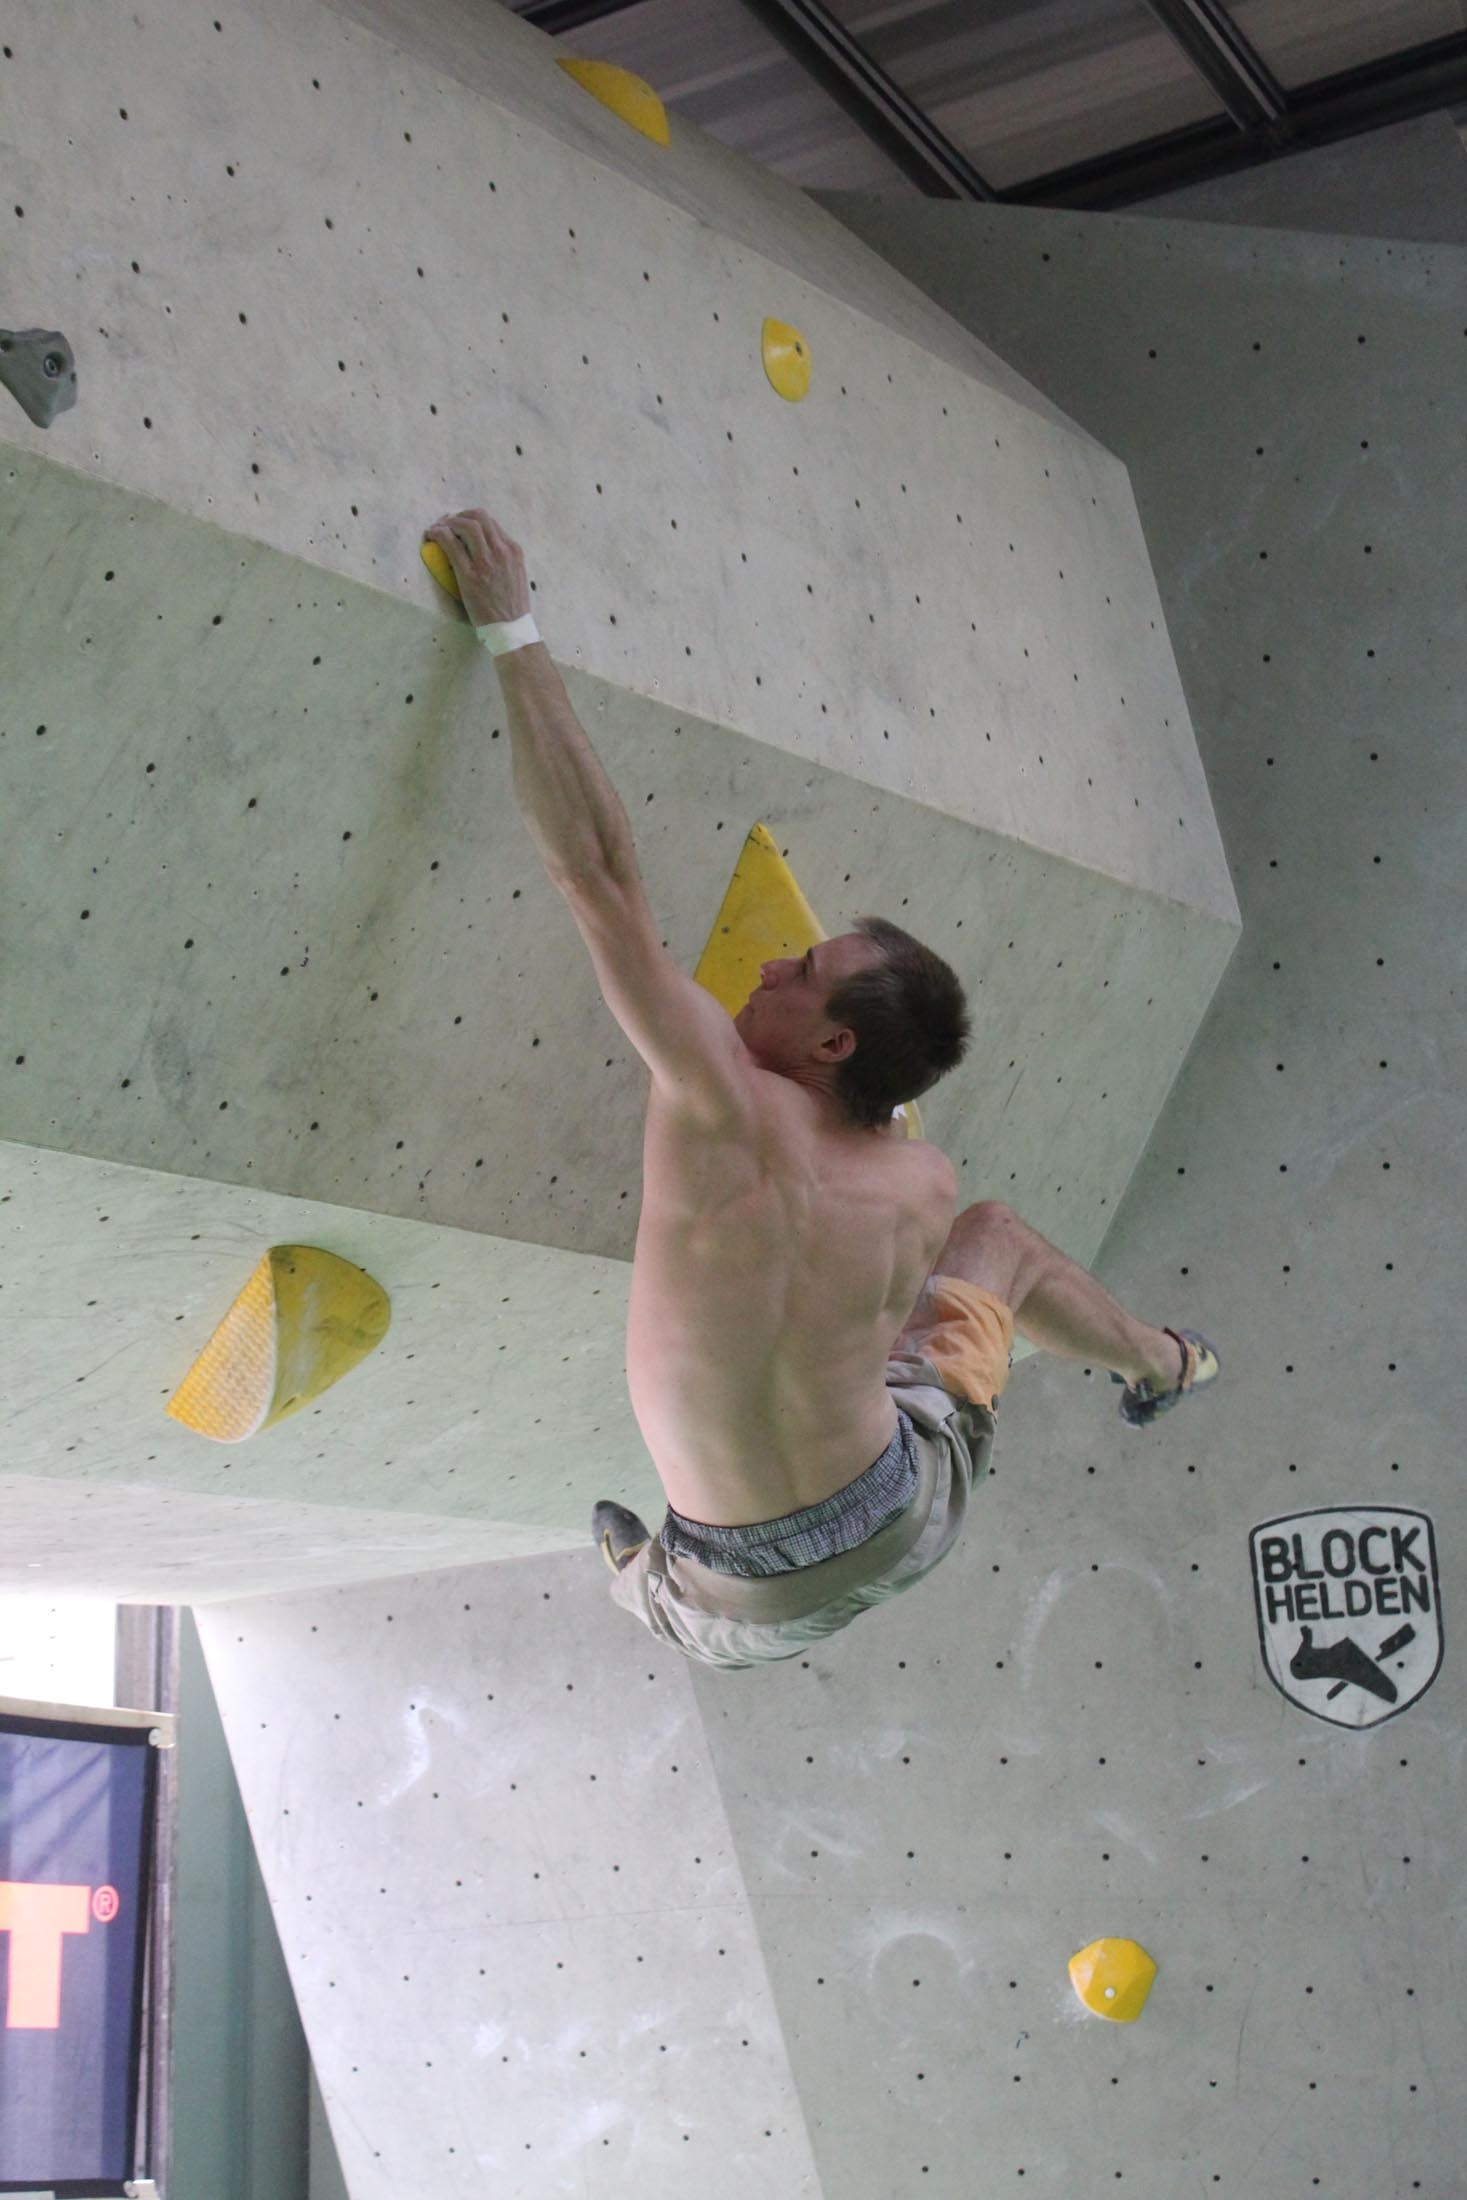 Quali, internationaler bouldercup Frankenjura 2016, BLOCKHELDEN Erlangen, Mammut, Bergfreunde.de, Boulderwettkampf07092016179